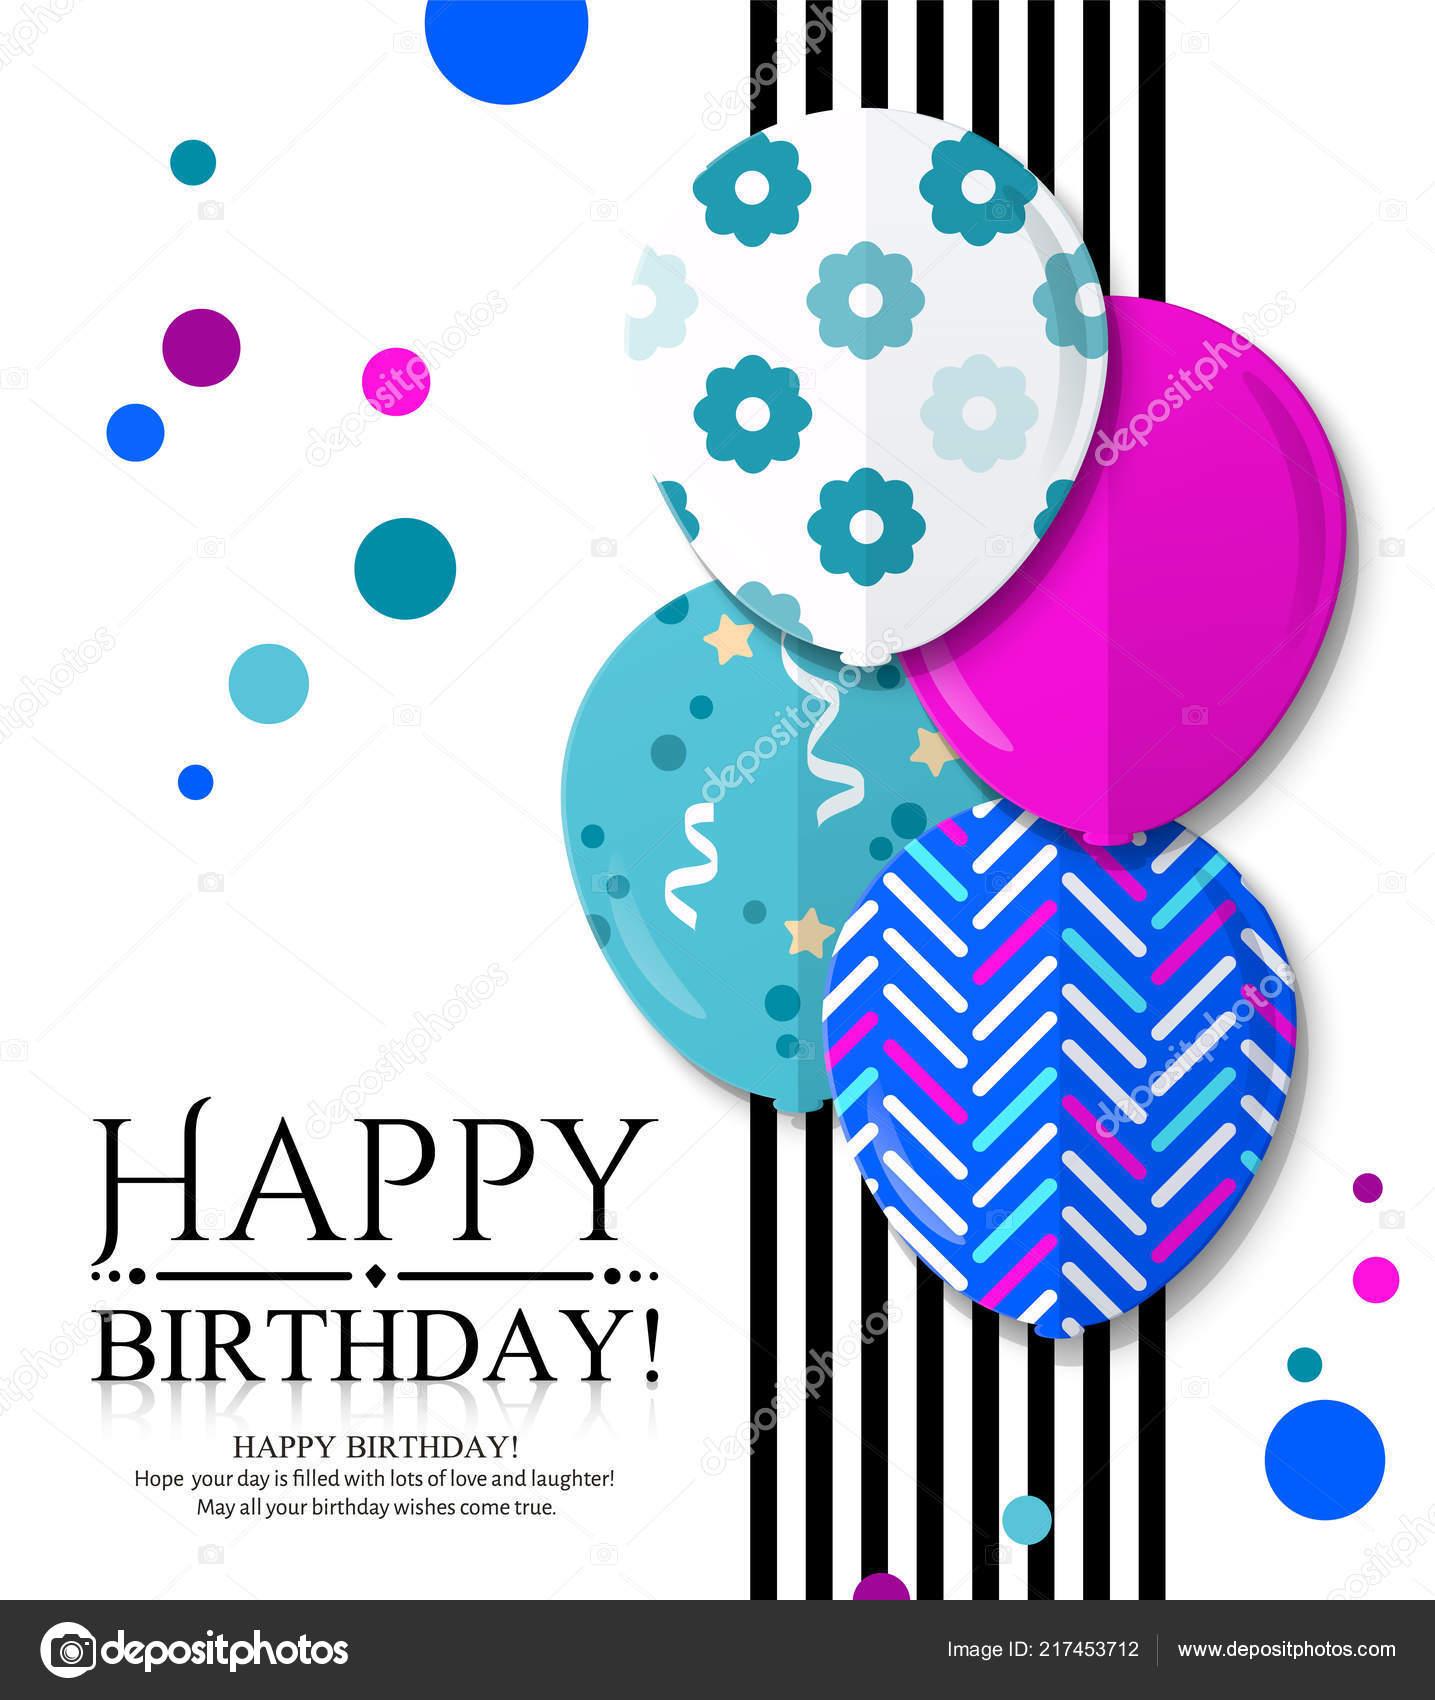 https depositphotos com 217453712 stock illustration happy birthday invitation card with html